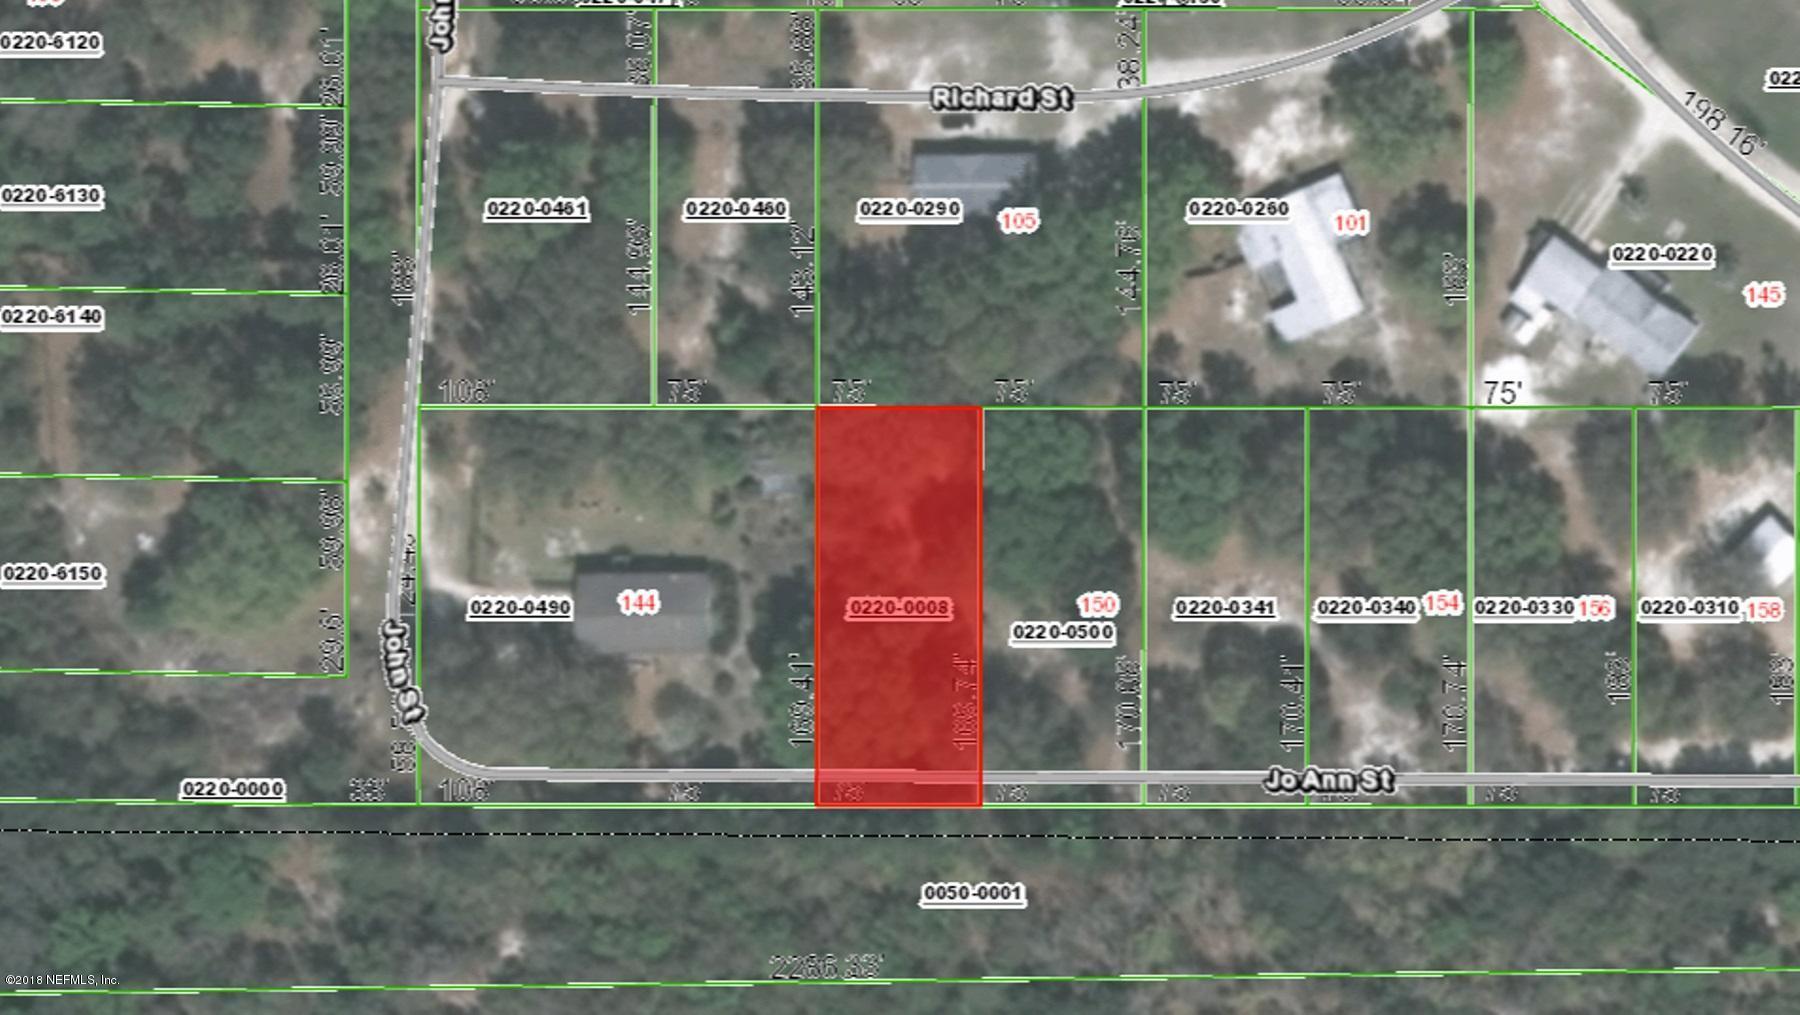 000 JO ANN, HAWTHORNE, FLORIDA 32640, ,Vacant land,For sale,JO ANN,936701